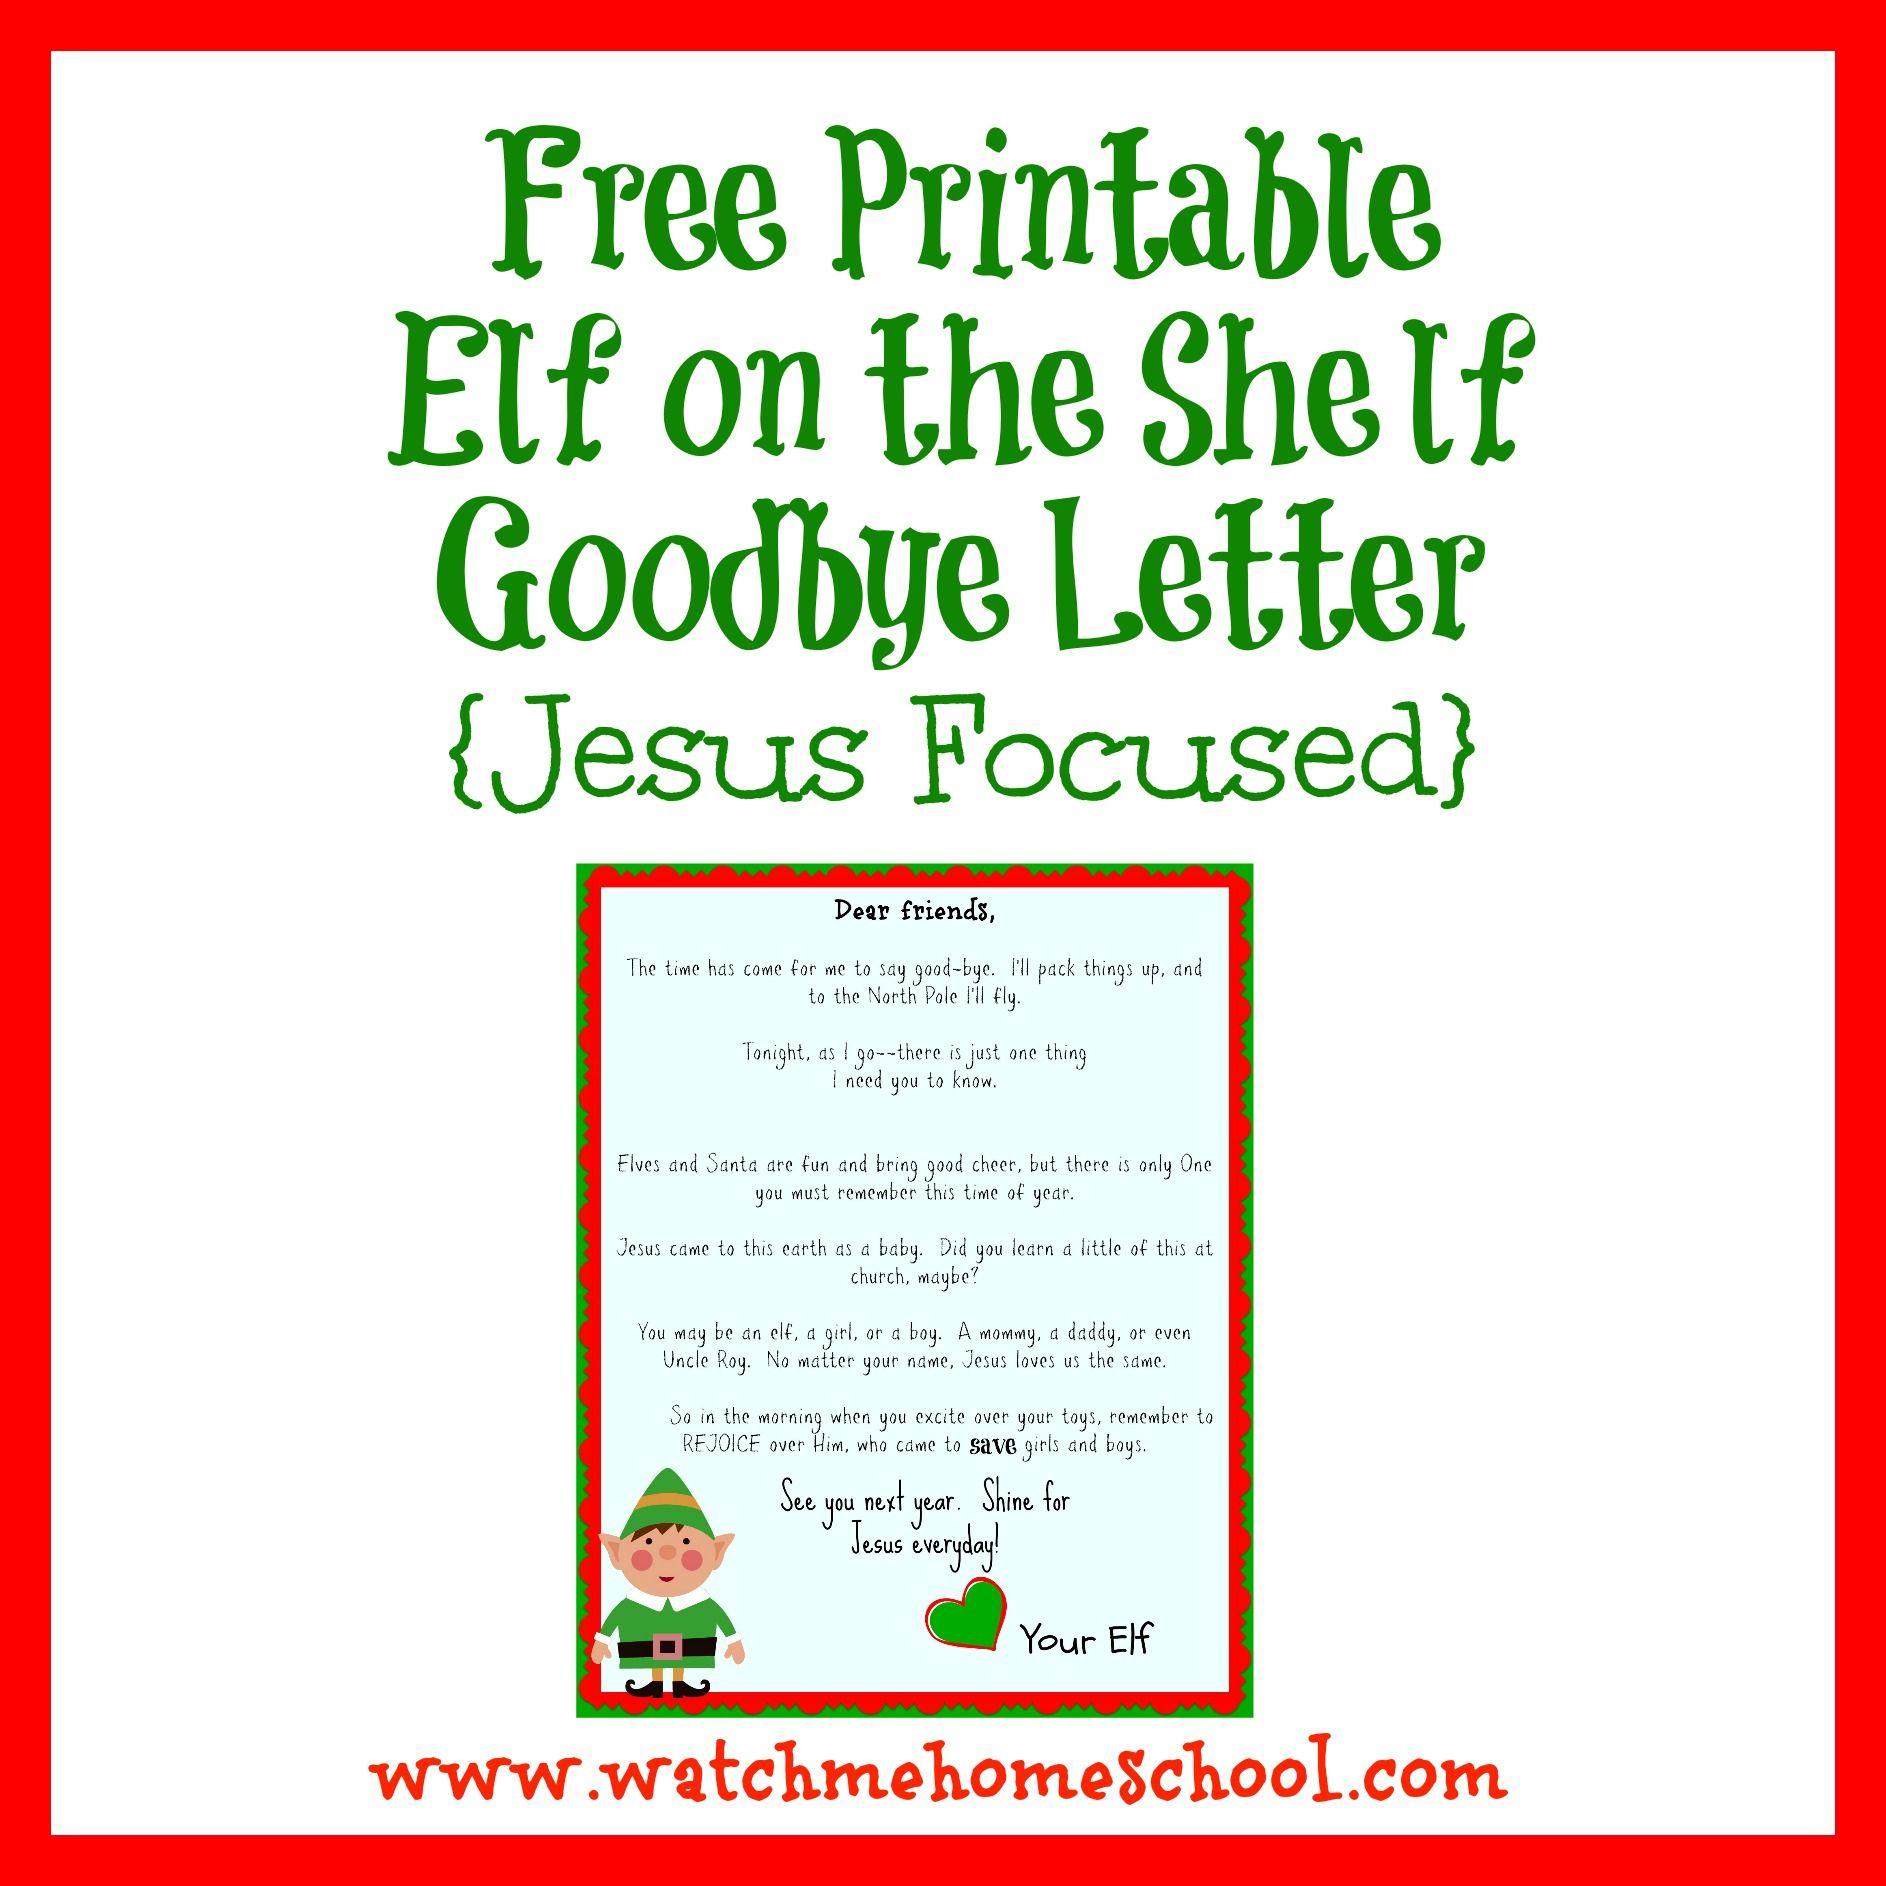 Elf On The Shelf Farewell Letter Printable | Elf On The Shelf - Elf On The Shelf Goodbye Letter Free Printable